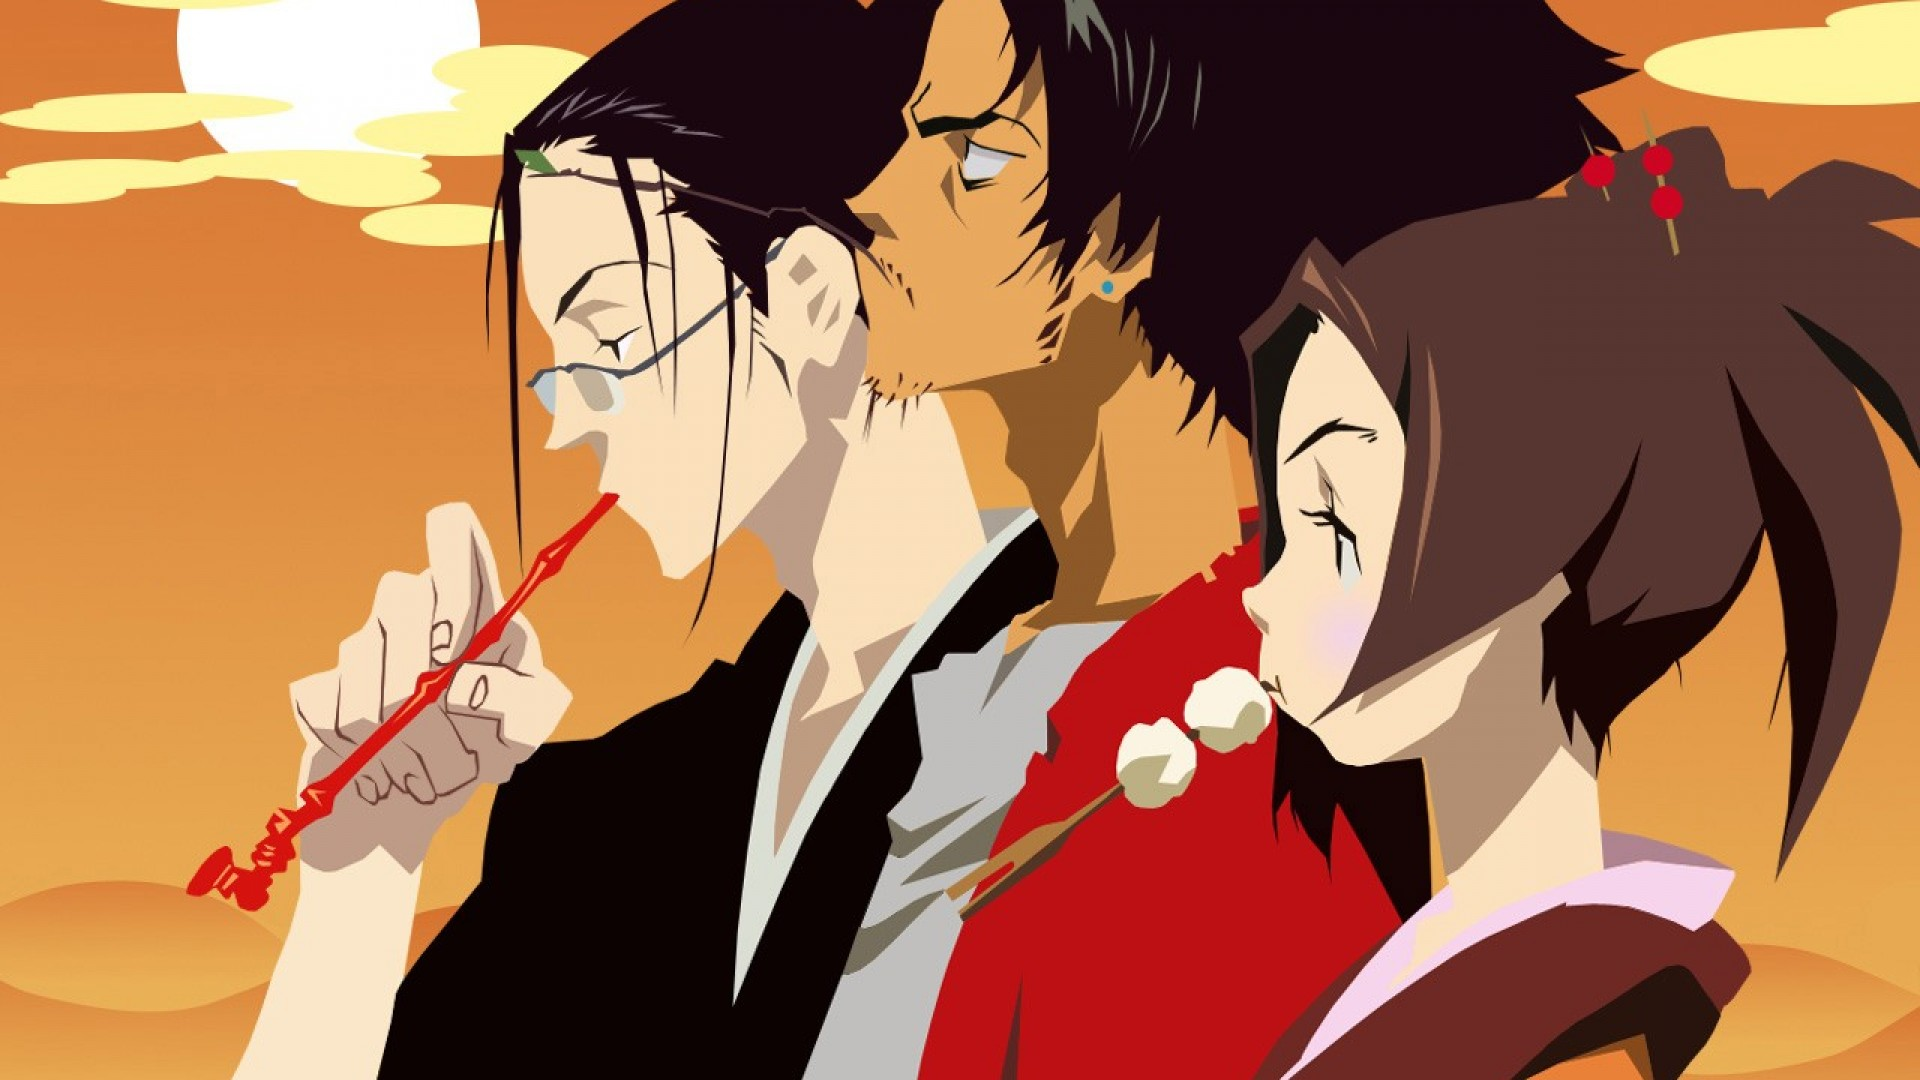 En iyi anime diziler Samurai Champloo